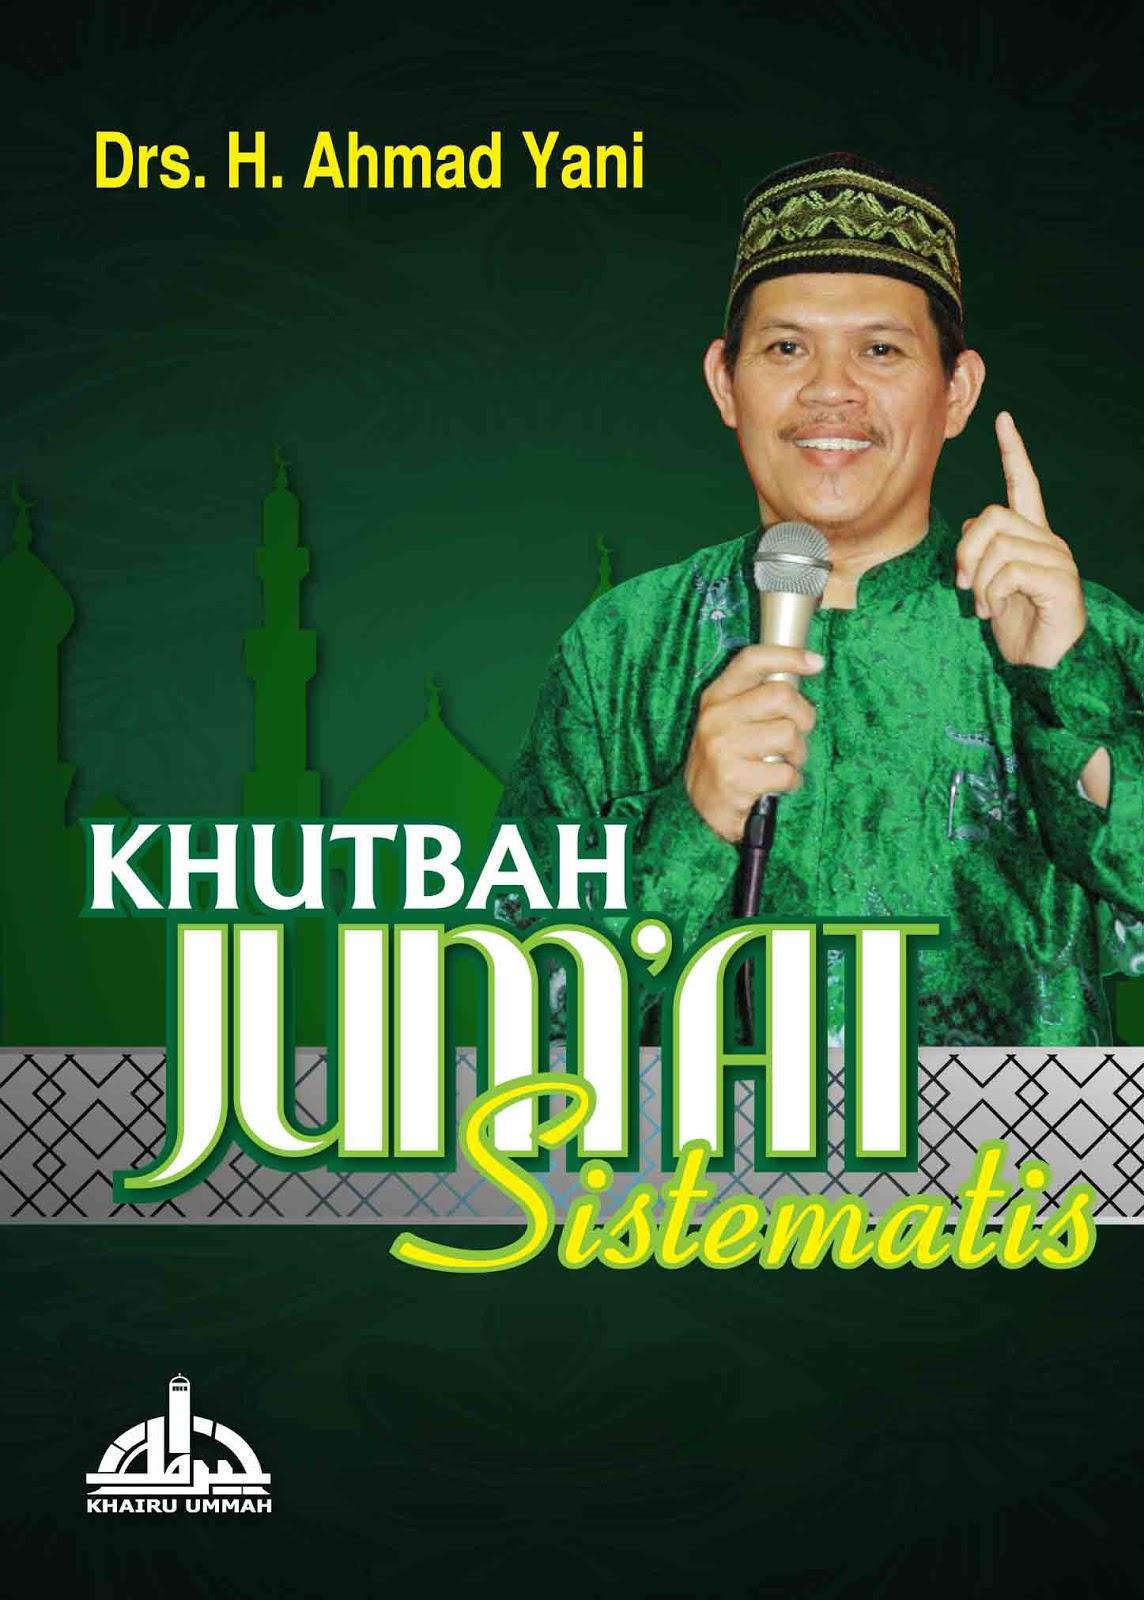 Lppd Khairu Ummah Khutbah Jumat Sistematis